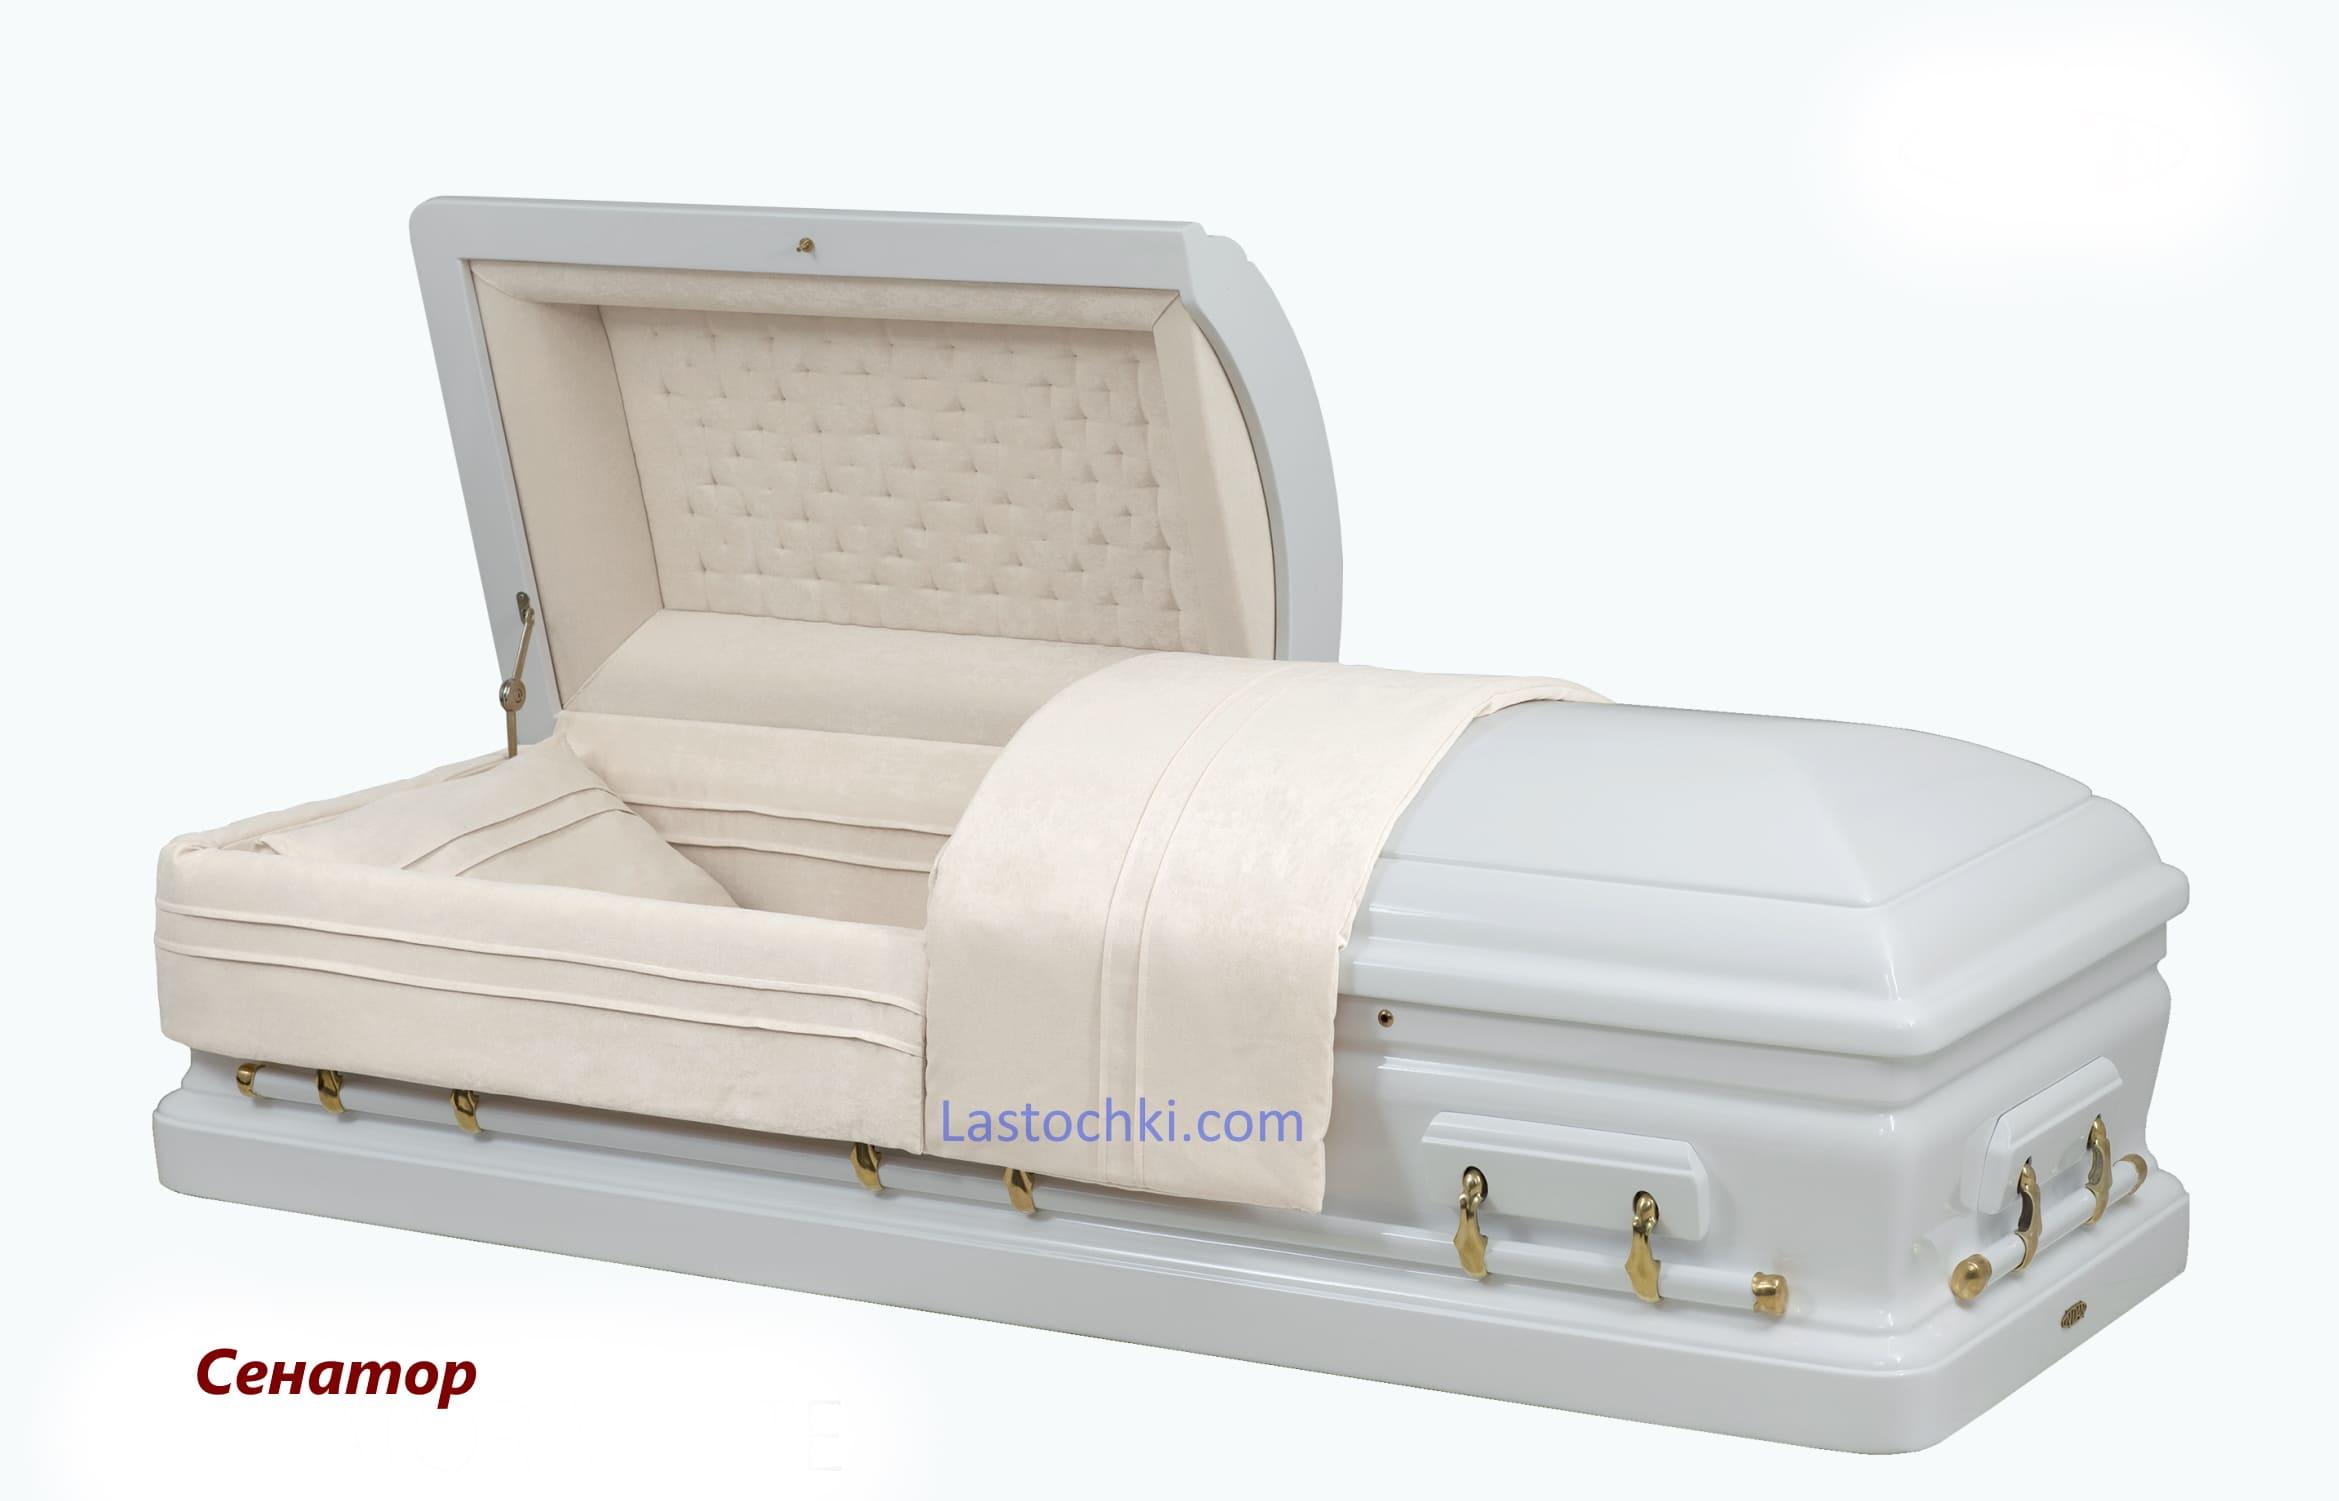 Саркофаг Сенатор белый  - Цена 160 000 грн.